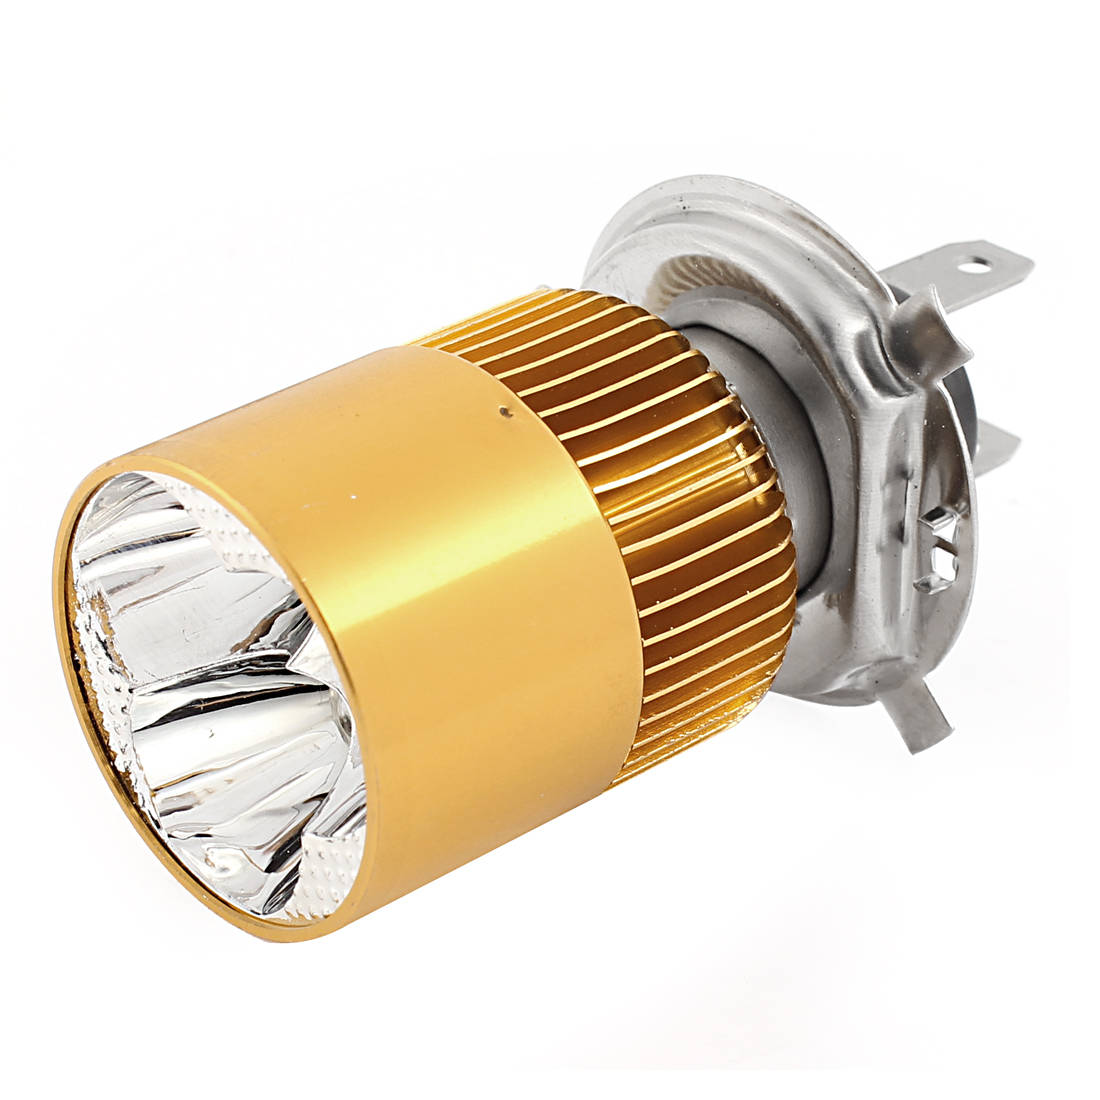 Unique Bargains Motorbike DC 9V-80V 8W H4 Headlamp 3 White  Indicator Light Foglamp Gold Tone